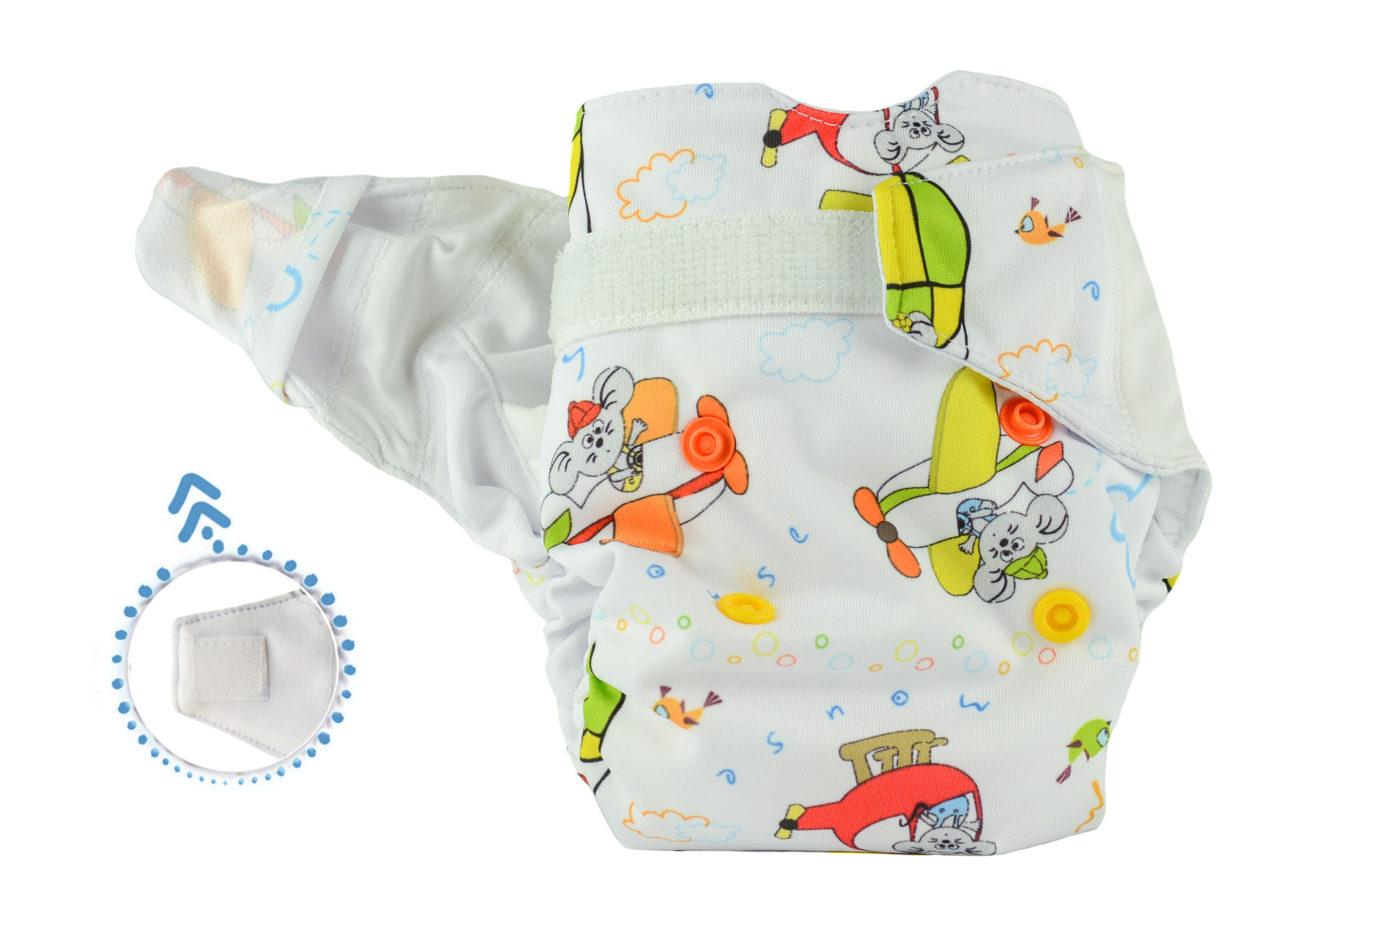 Diaper AIO Newborn (FLY)